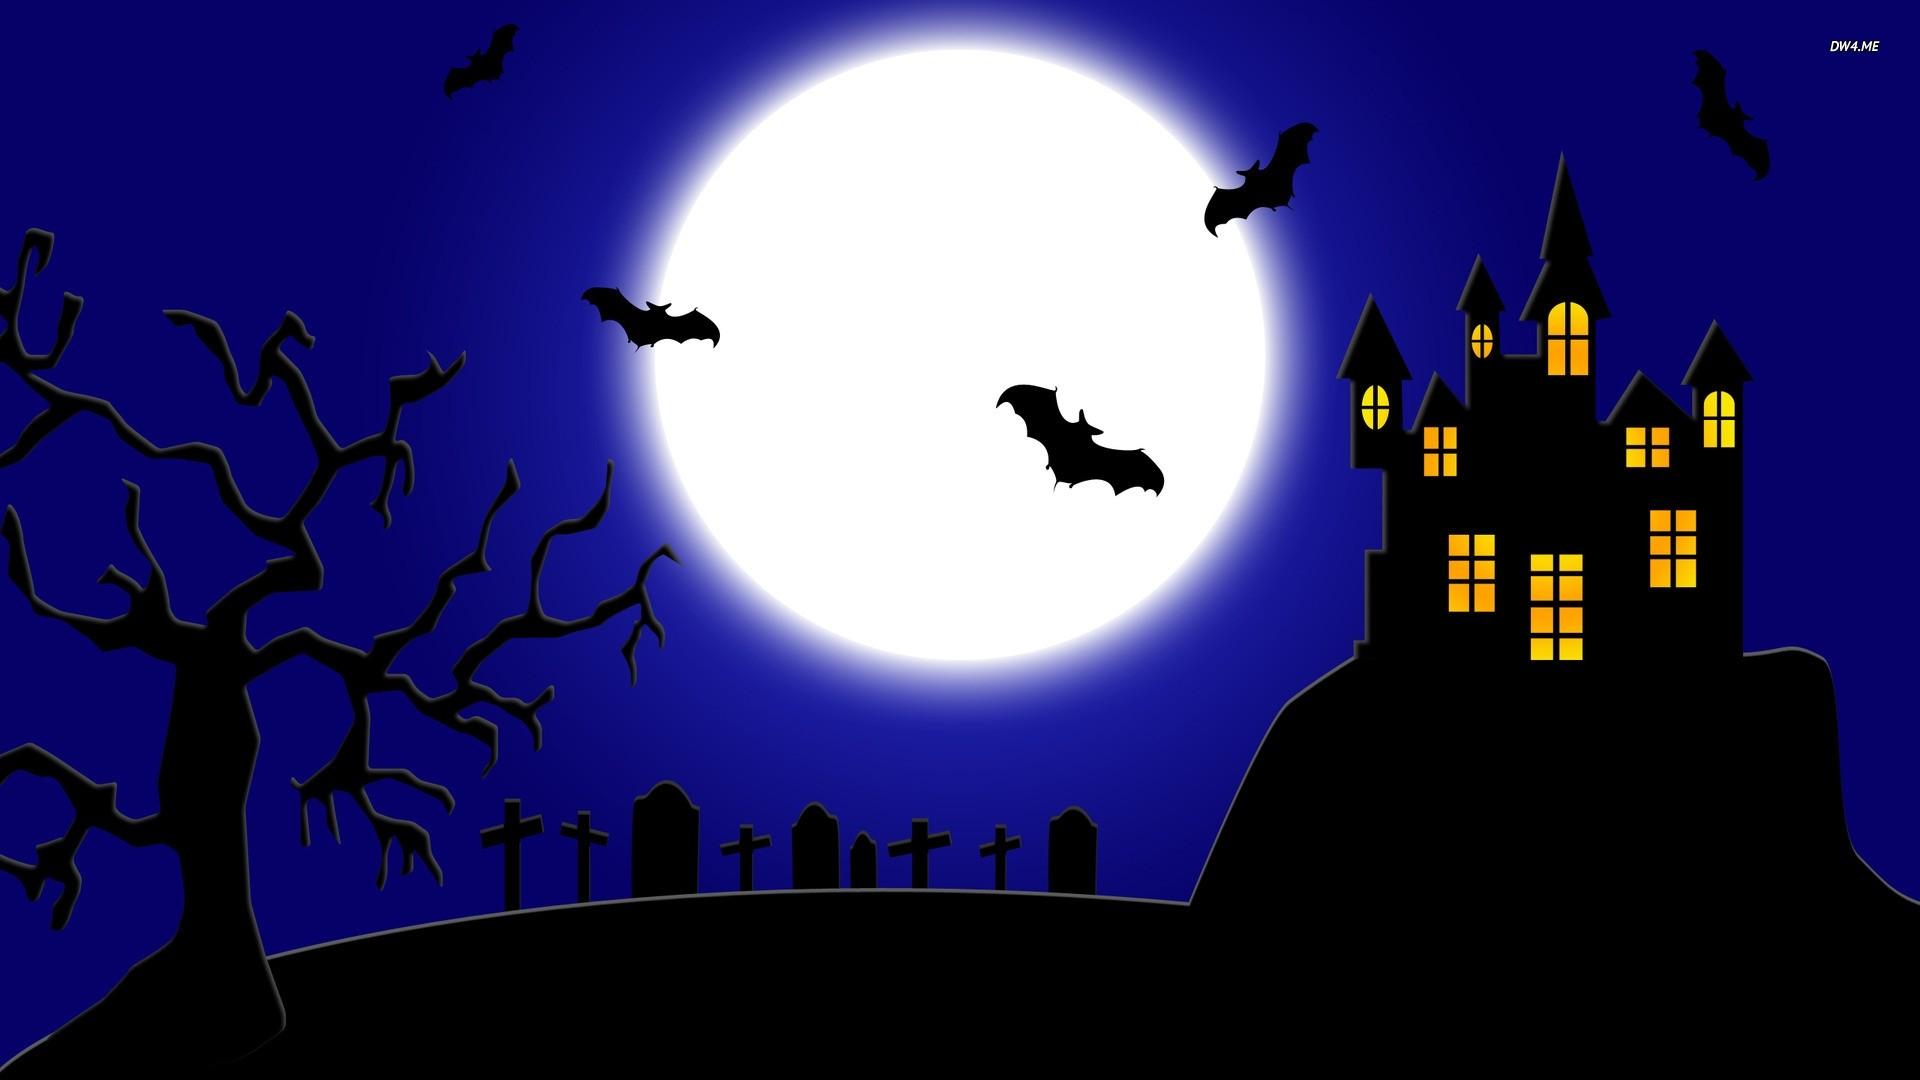 Spooky Vector HD Download